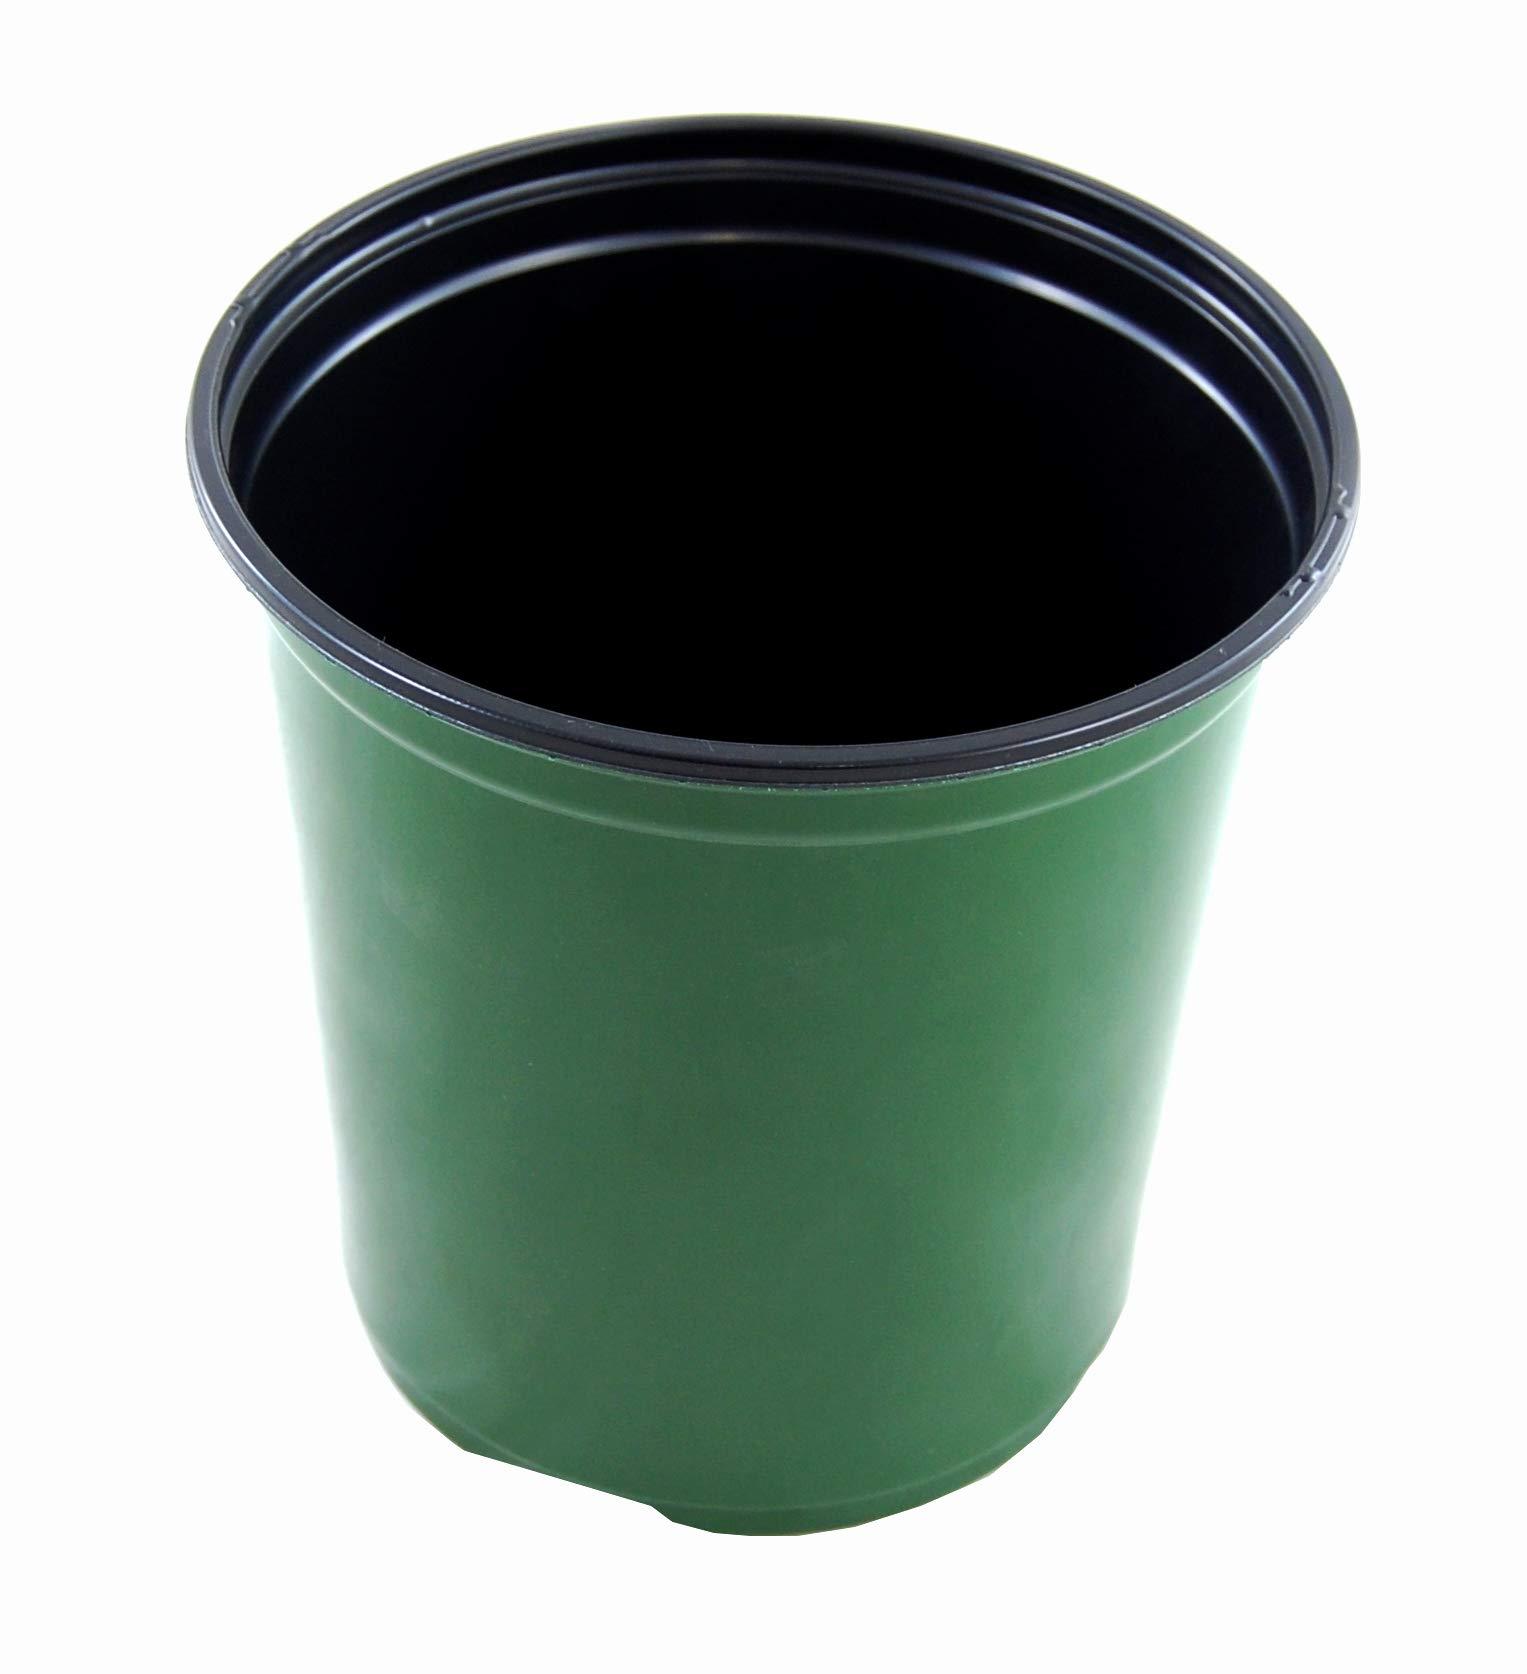 Plastic Nursery 1 Gallon - Plant Flower Pot - Green - 270 Pots By Growers Solution